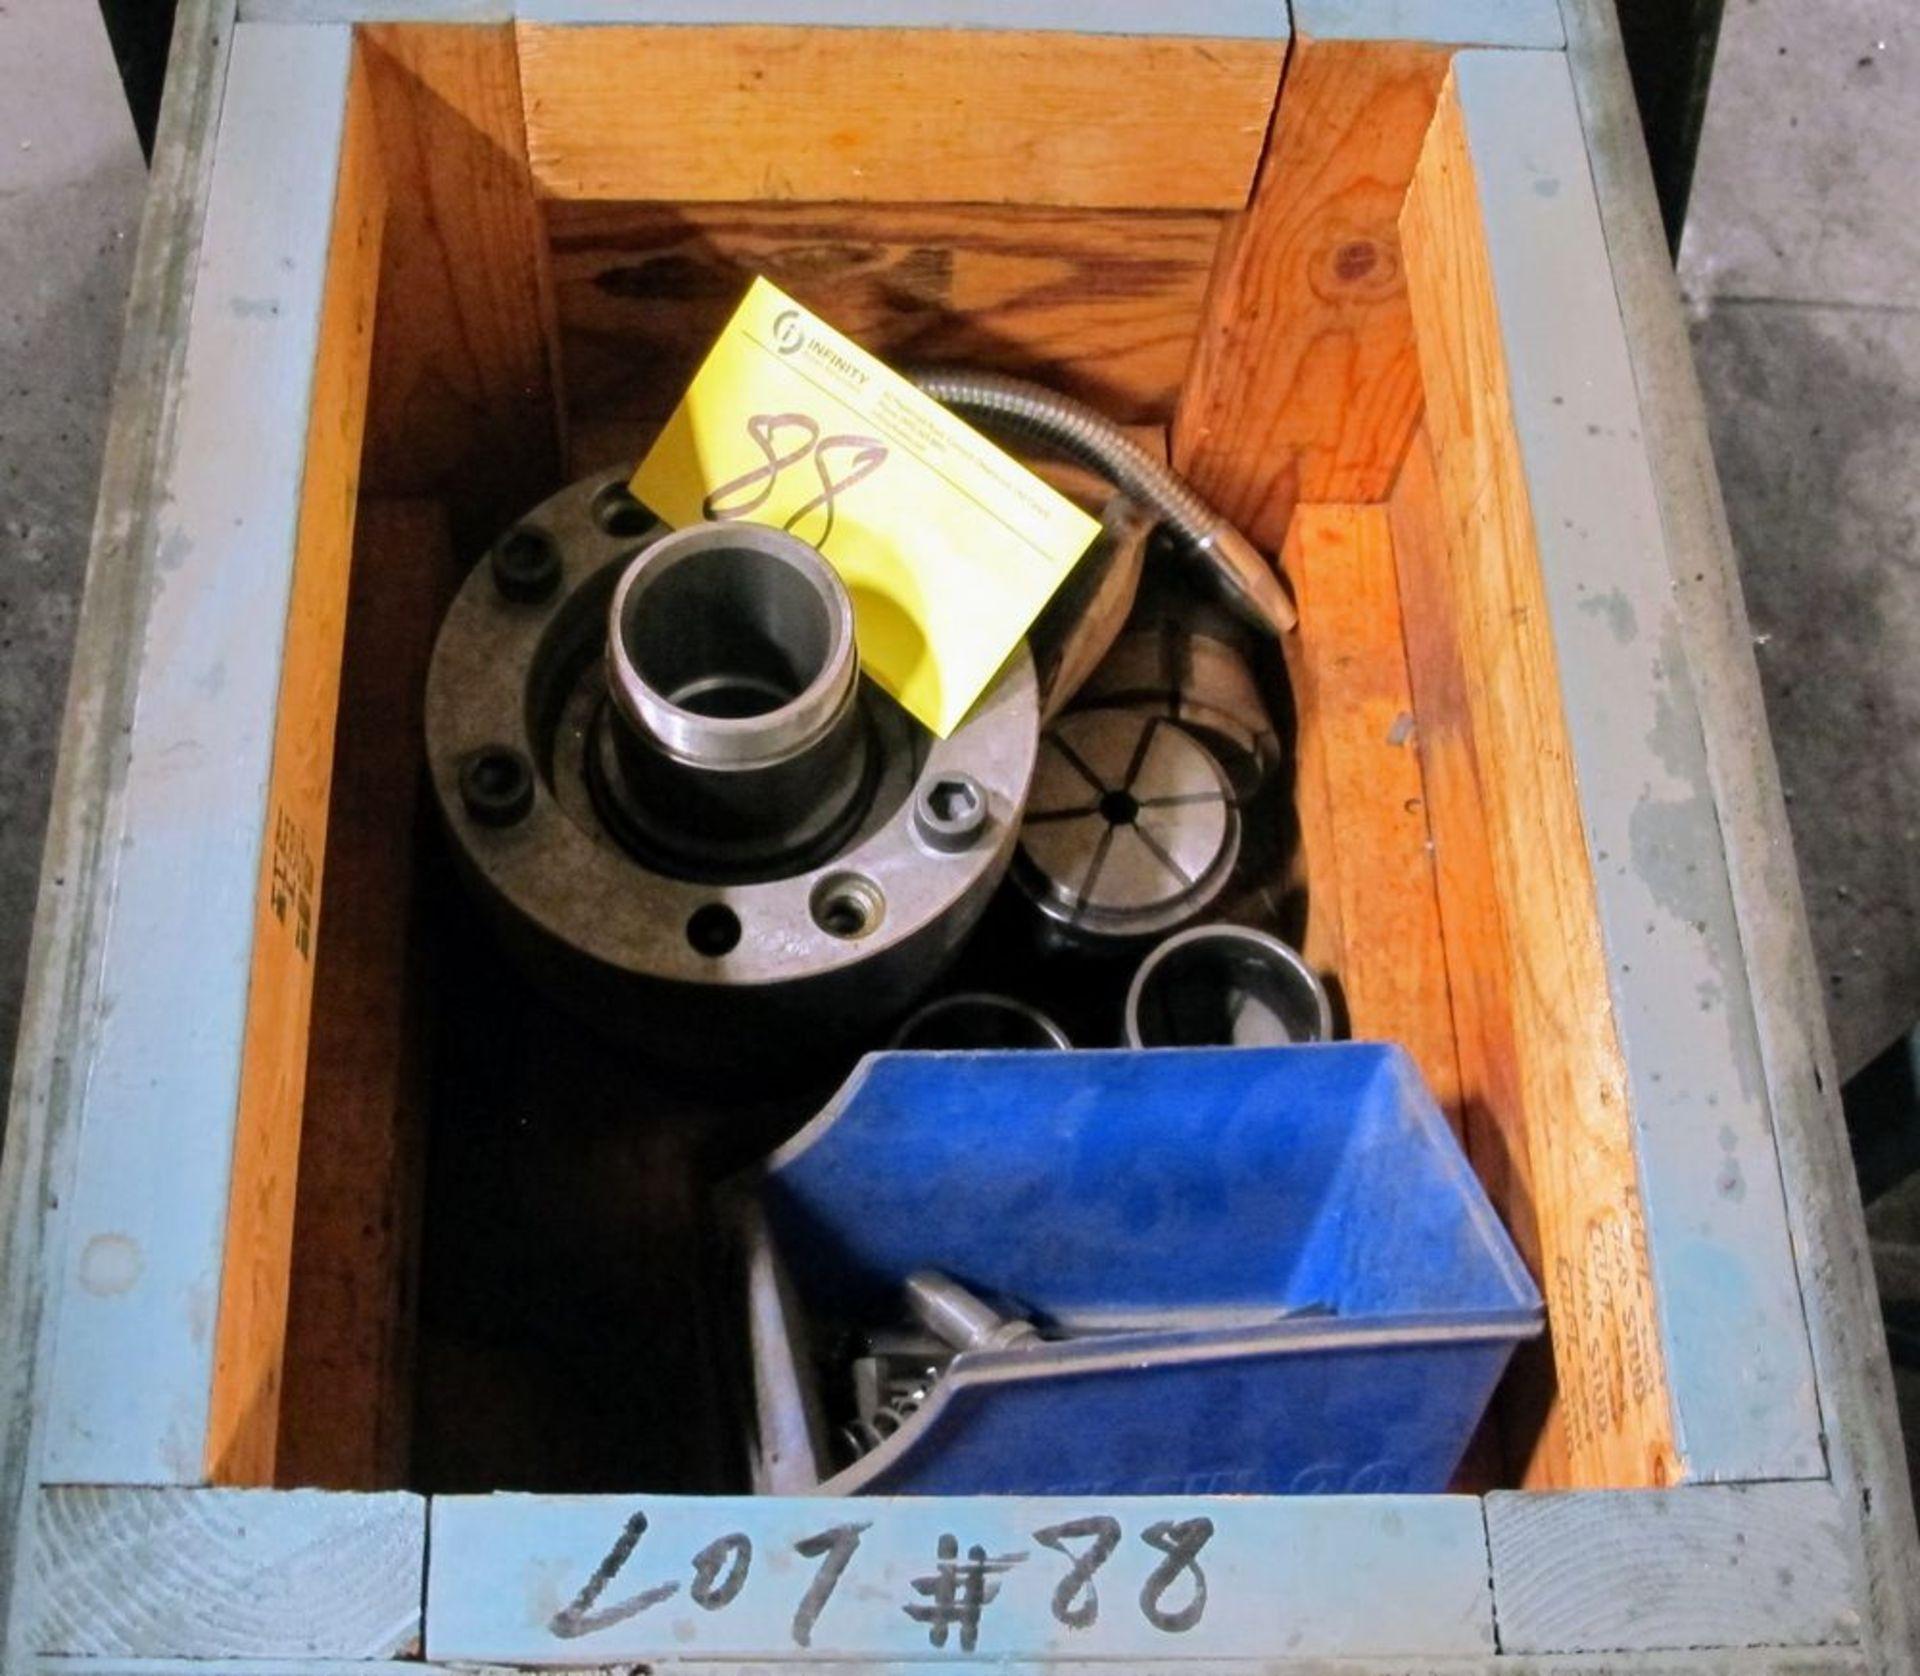 "Lot 88 - NAKAMURA-TOME SC-300 CNC Lathe, Fanuc Series 21-T CNC Control, 10"" 3-Jaw Chuck, Tailstock, Turret,"